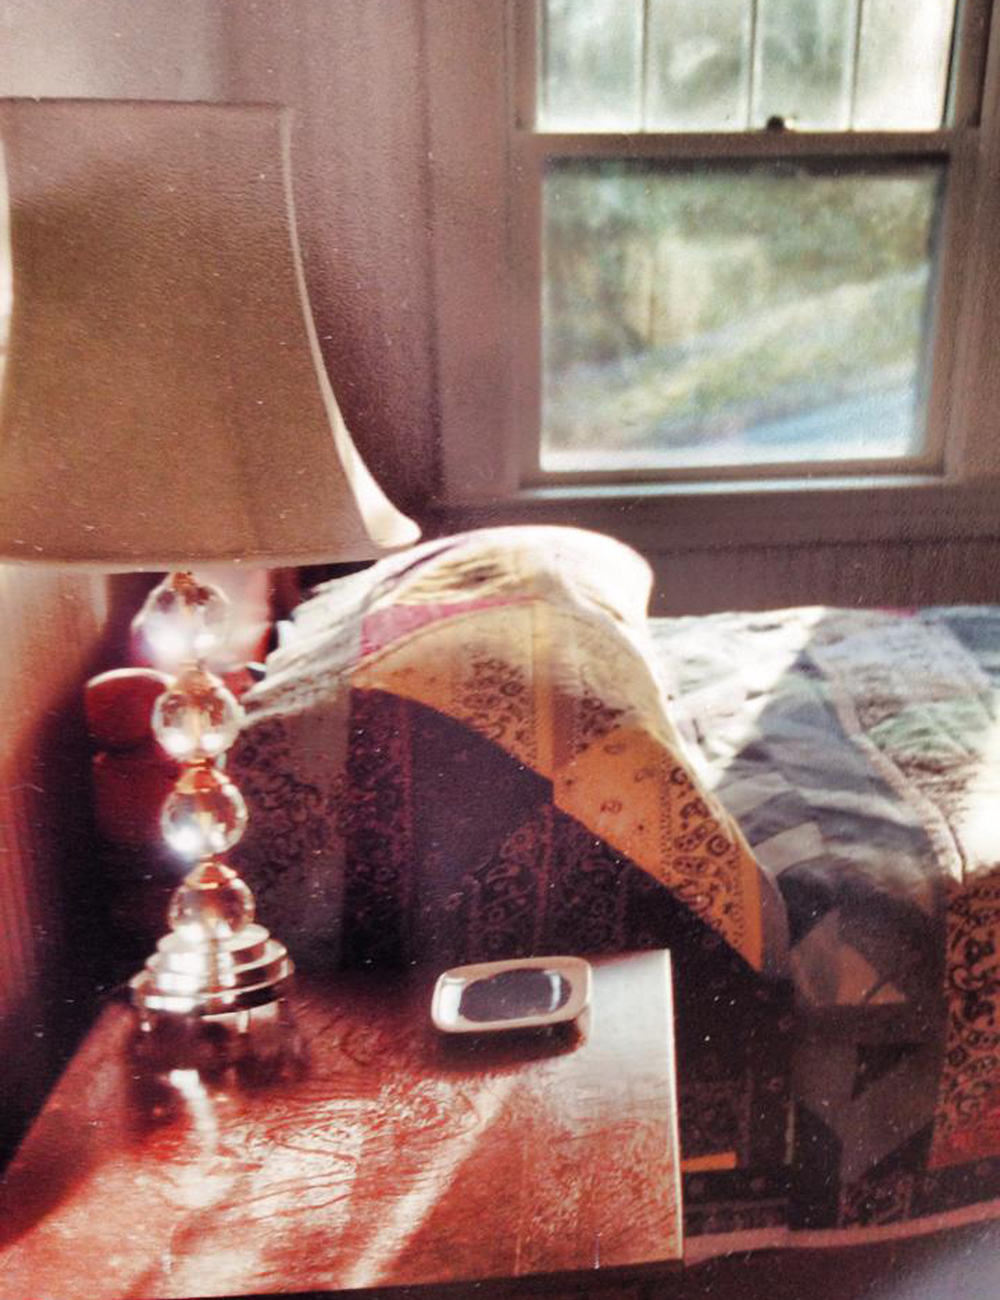 jackson quilt grandmas room.jpg